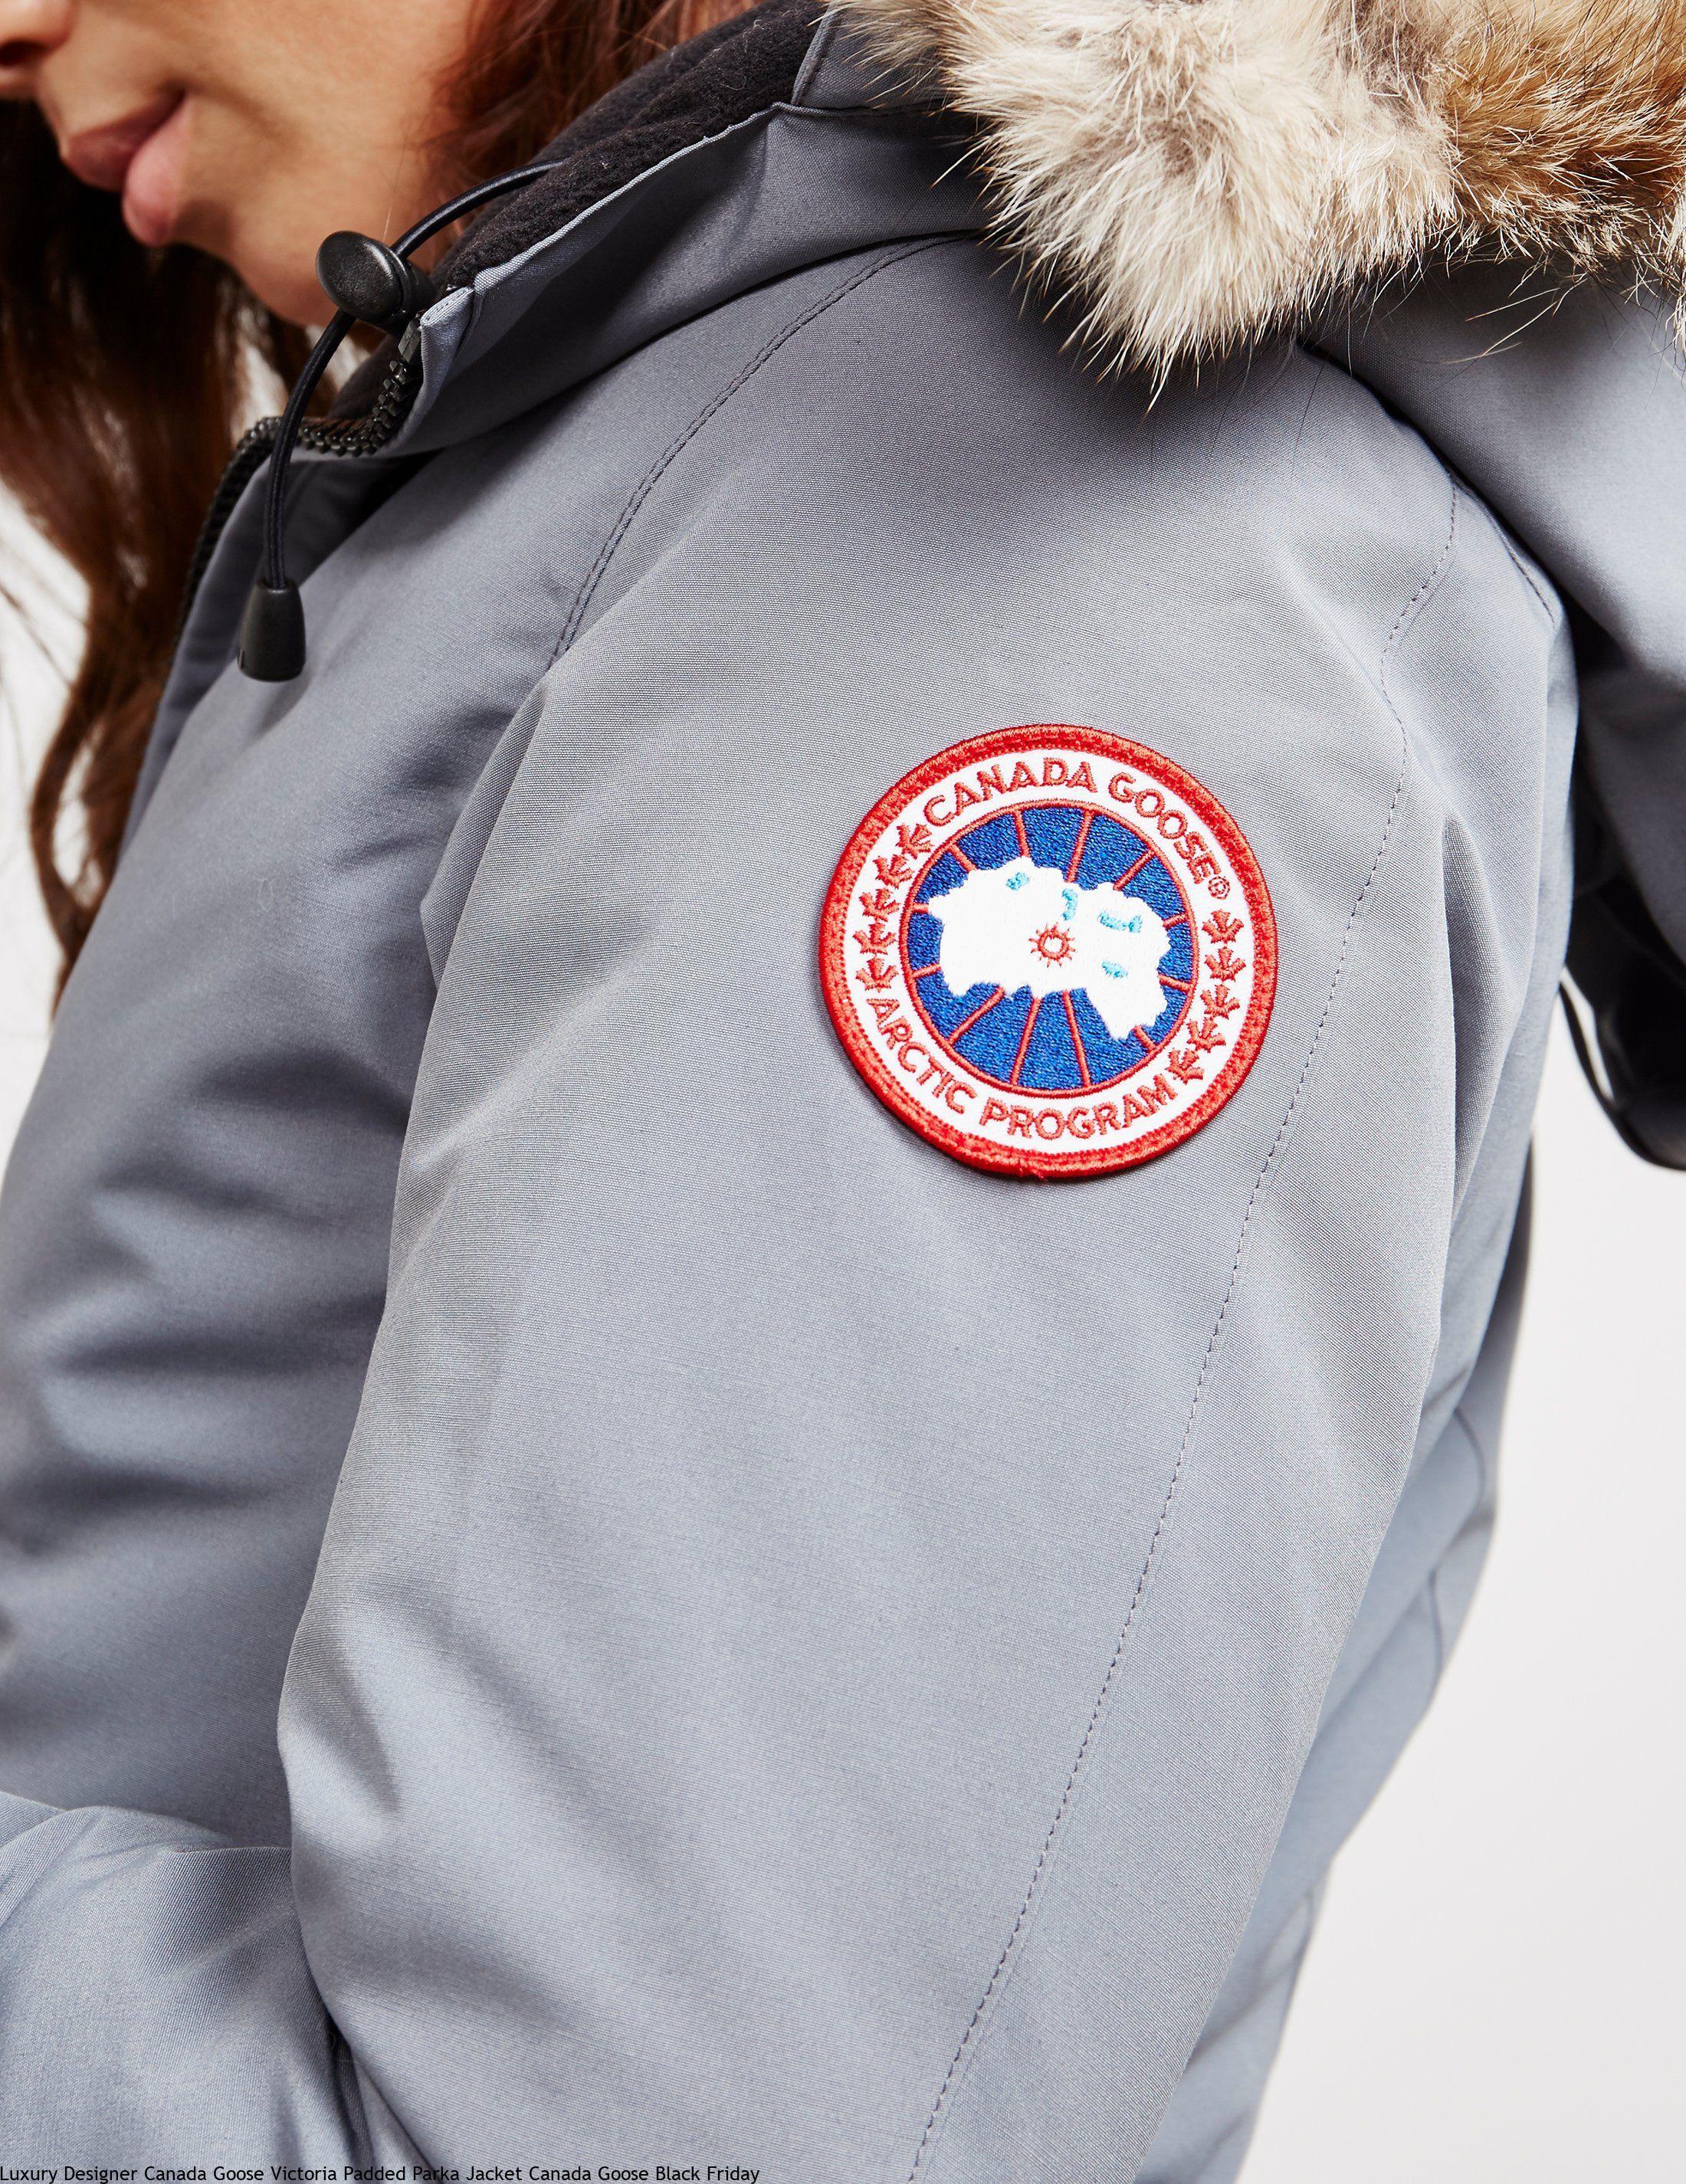 b1ee689c843 Luxury Designer Canada Goose Victoria Padded Parka Jacket Canada Goose  Black Friday – Canada Goose Outlet Sale: Cheap Canada Goose Jackets